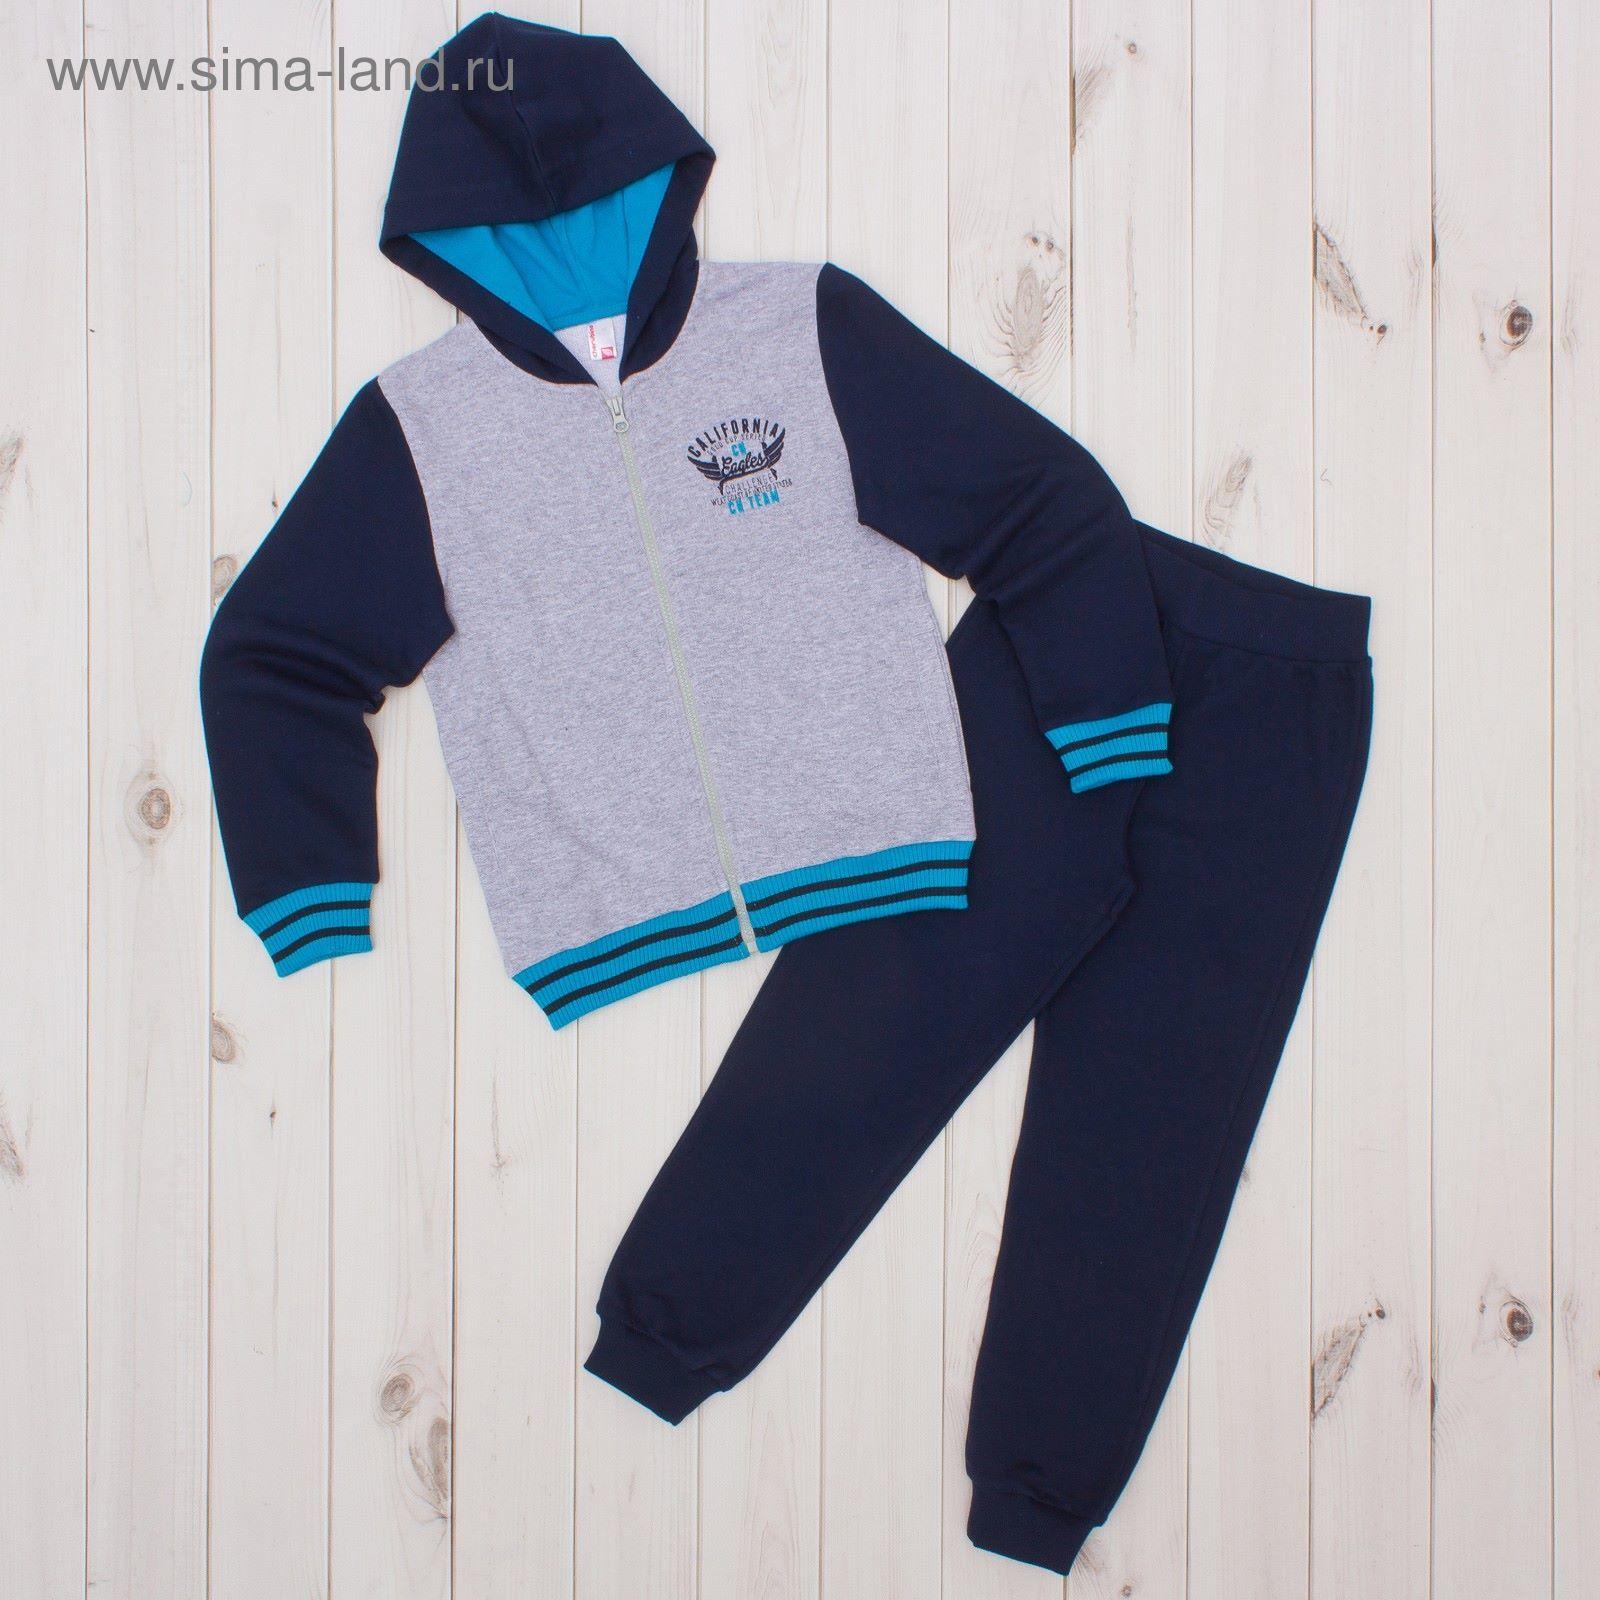 0b6bba8e Костюм спортивный для мальчика (куртка, брюки), рост134 см, цвет синий/